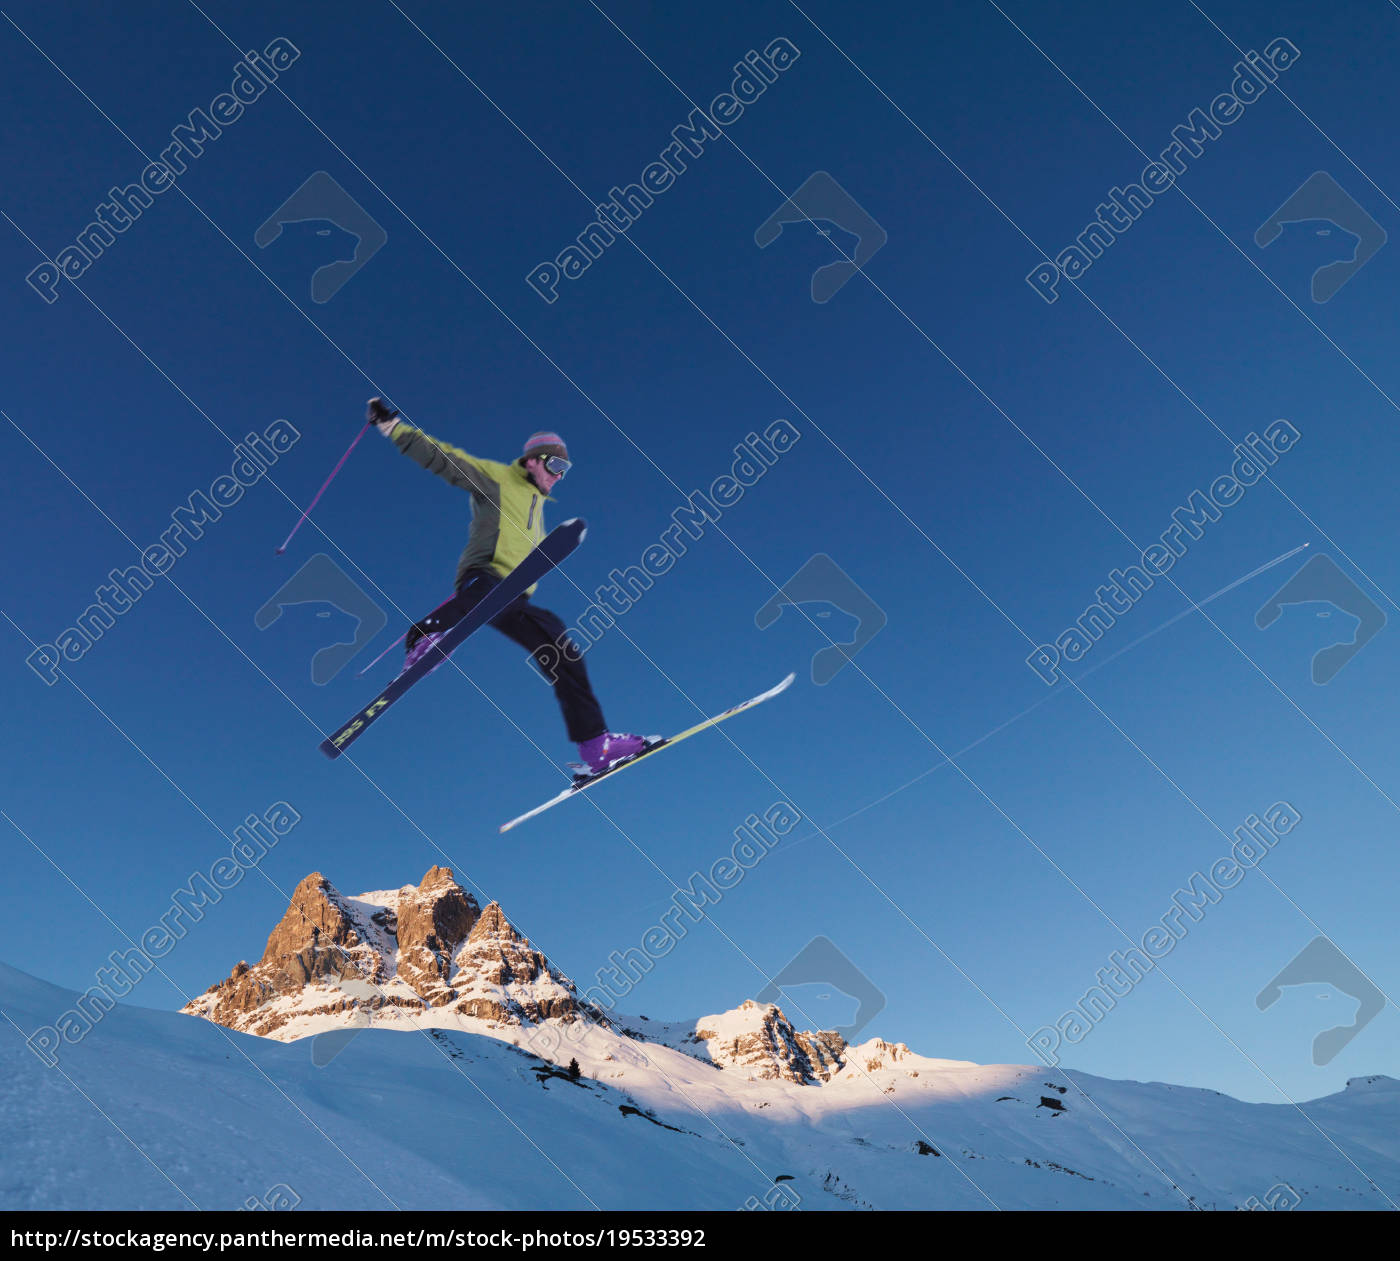 skier, jumping, across, skyline - 19533392